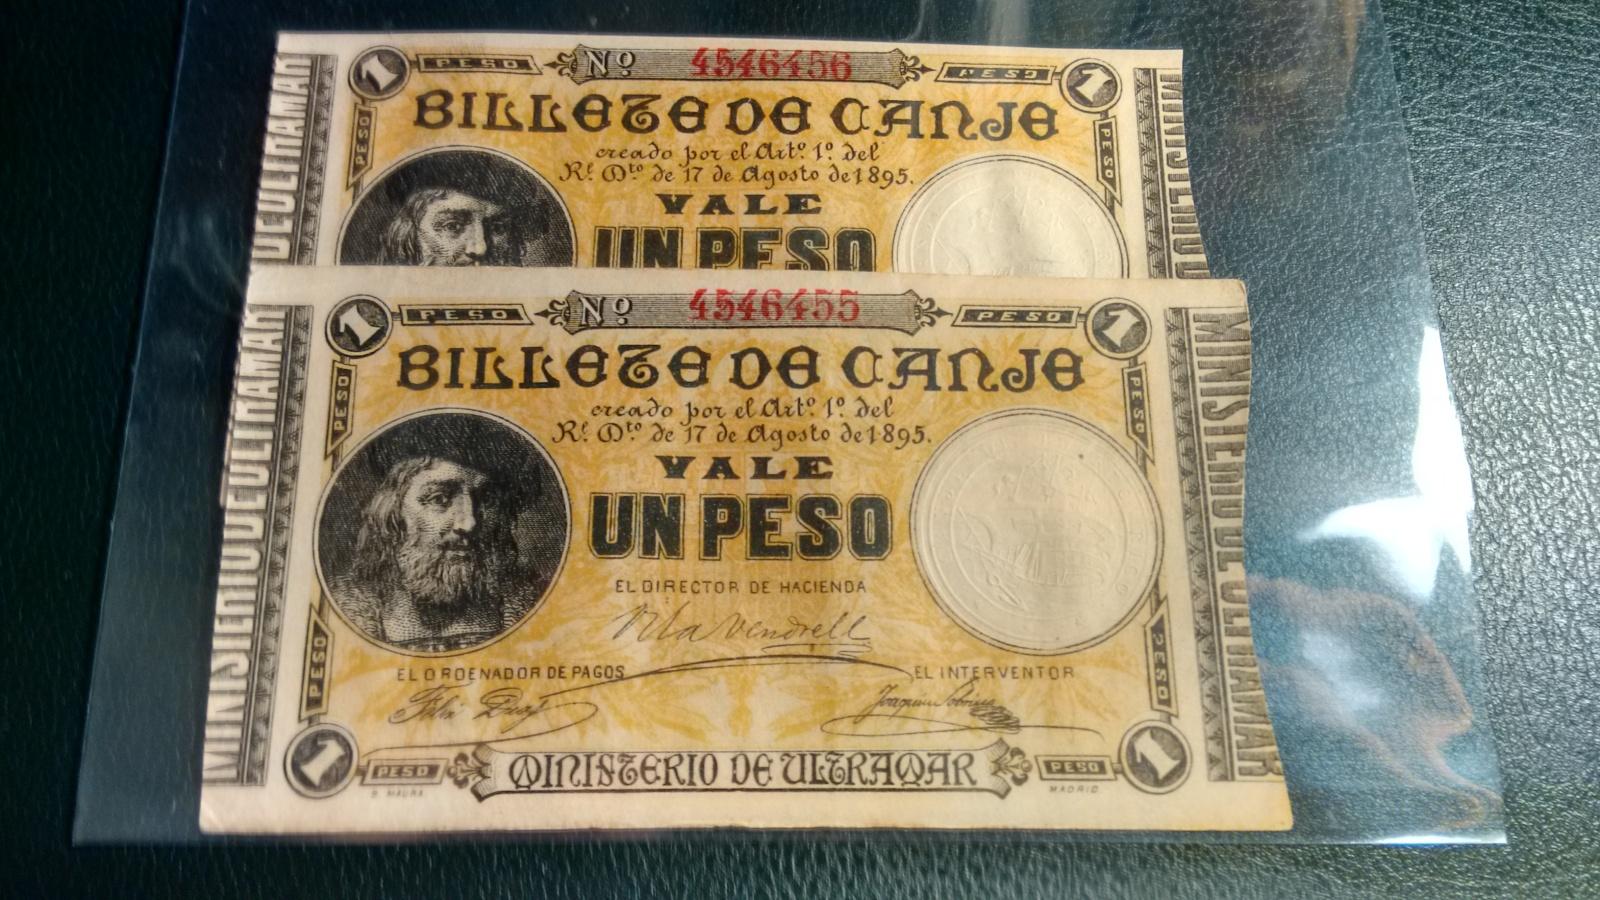 1 Peso 1895 Ultramar PUERTO RICO - Pareja correlativa - Ponce de León 9u1cut